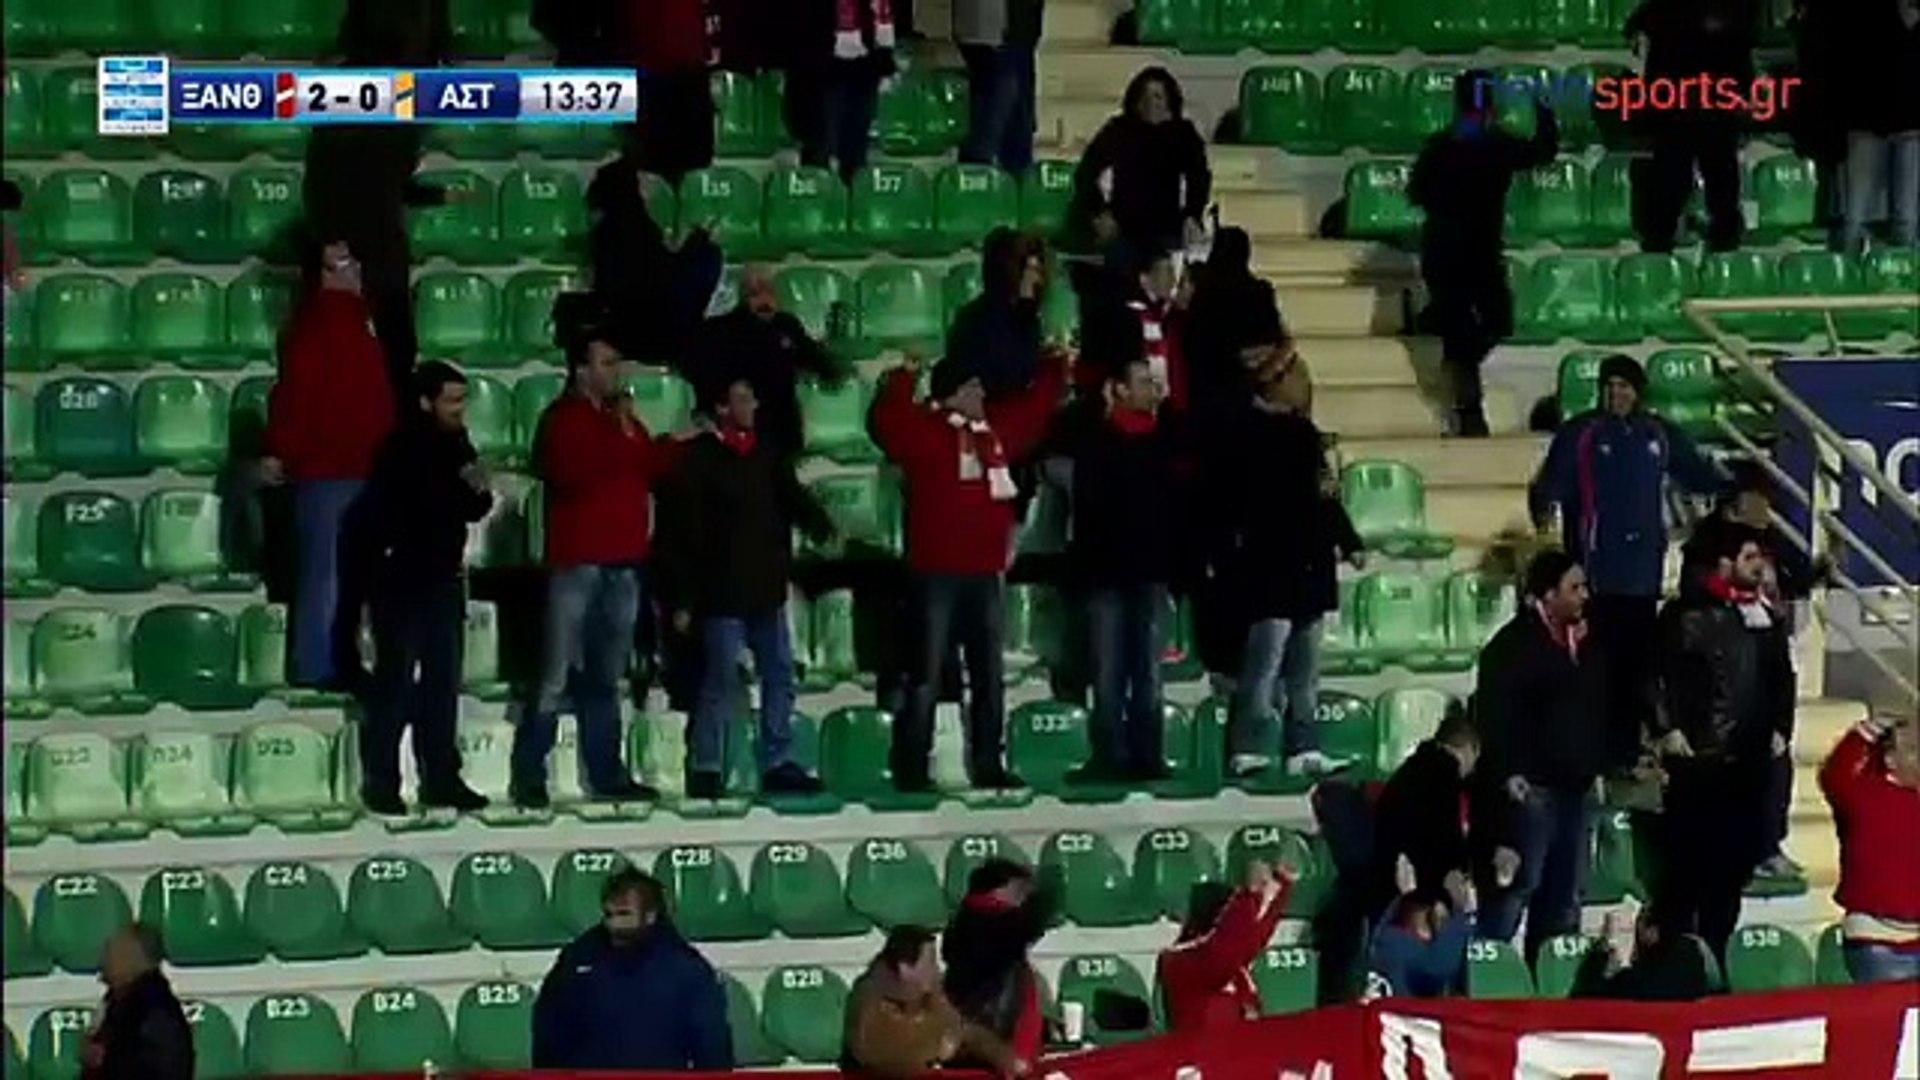 Superliga de Grecia 2016/17: J13 - Skoda Xanthi 3 - 1 Asteras (04.12.2016)